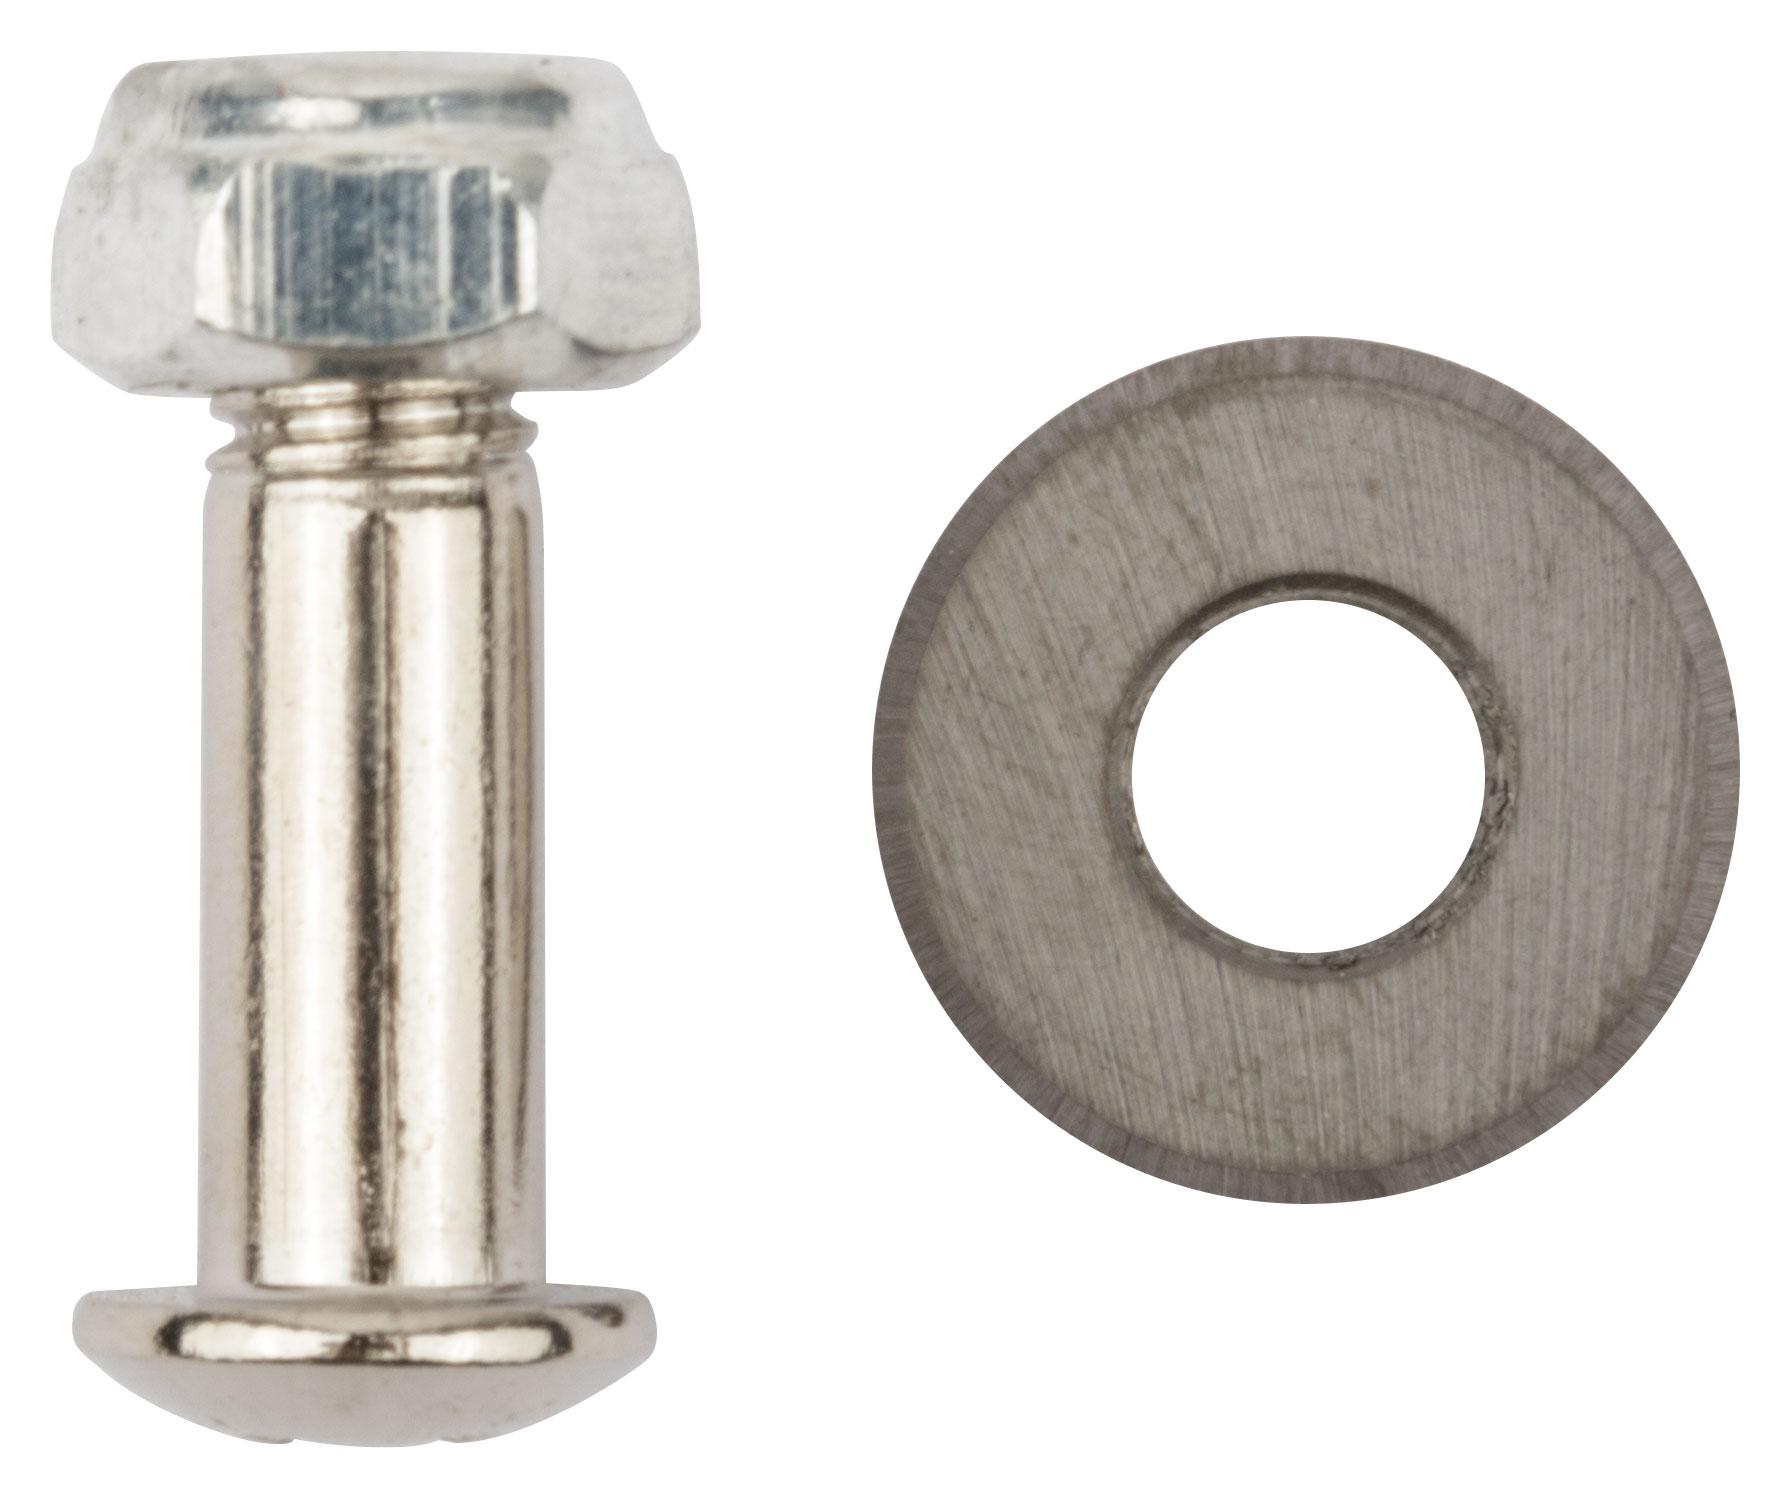 Ролик (диск) для плиткореза, 15мм Fit 16838